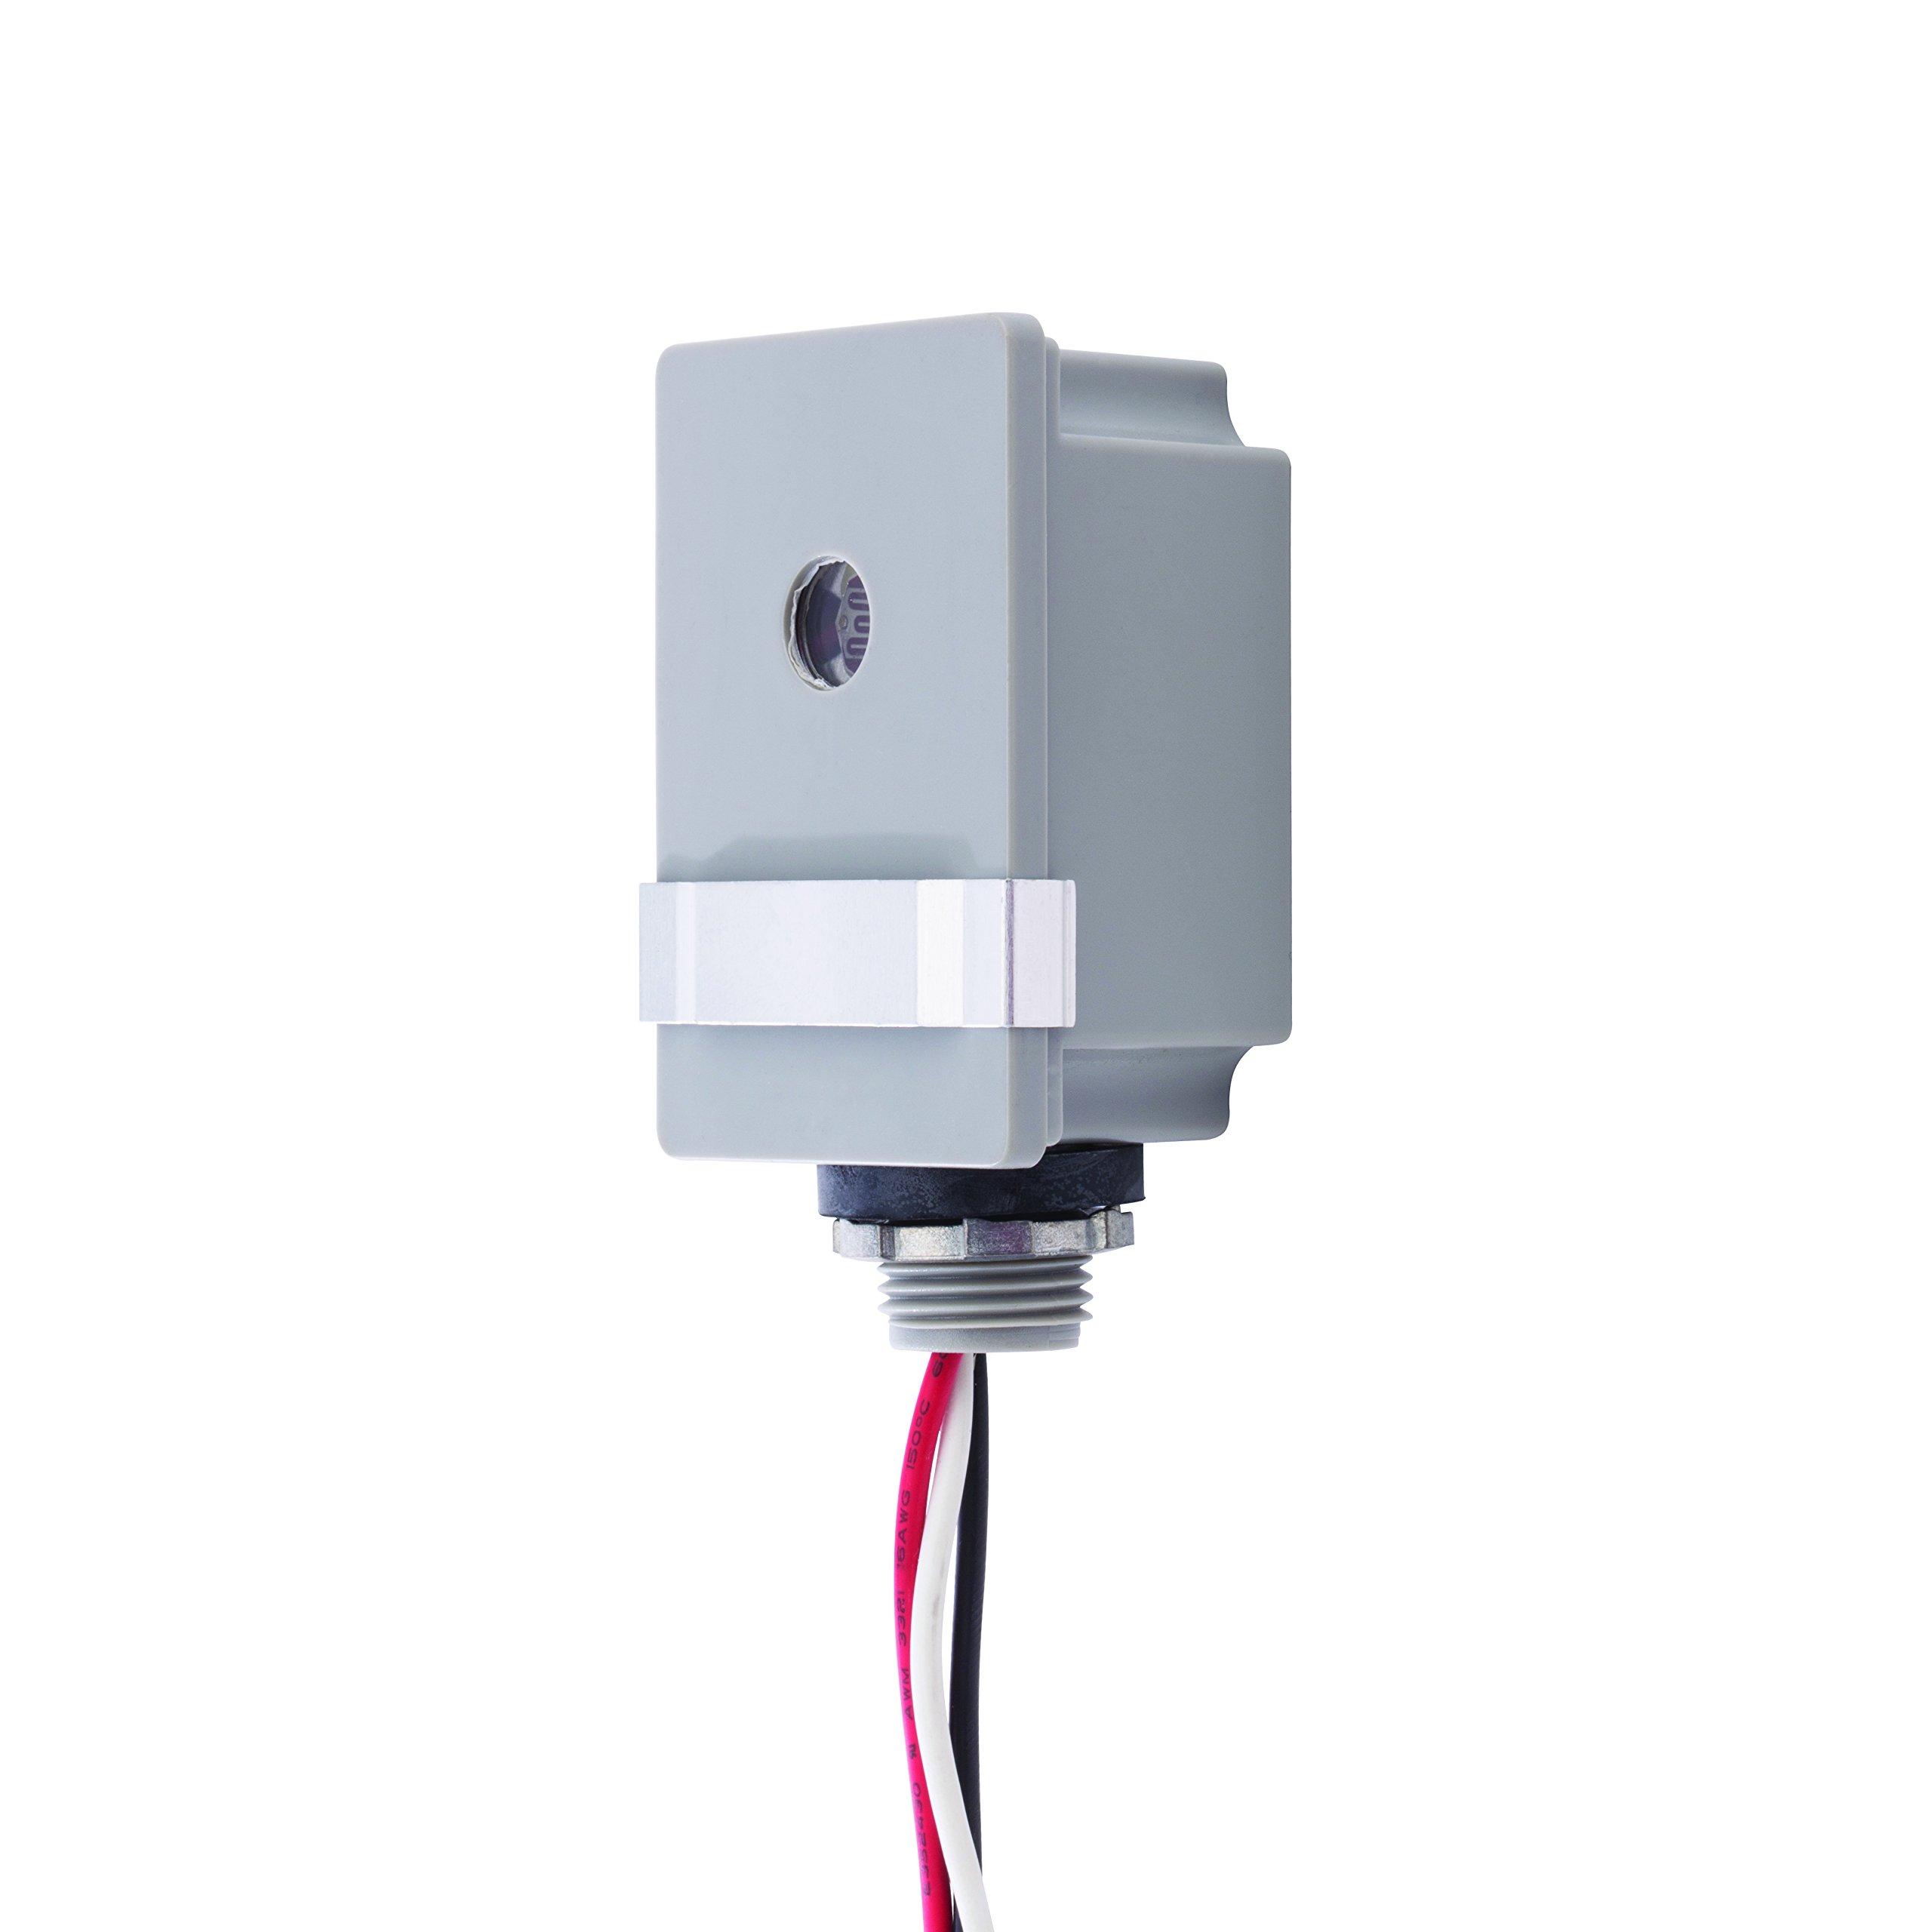 NSi Industries TORK RKP201 Outdoor 120-Volt Stem Mount Photocontrol With Light Adjustment Bar - Controls Lighting Dusk to Dawn - Compatible with Incandescent/Compact Fluorescent/Halogen/LED